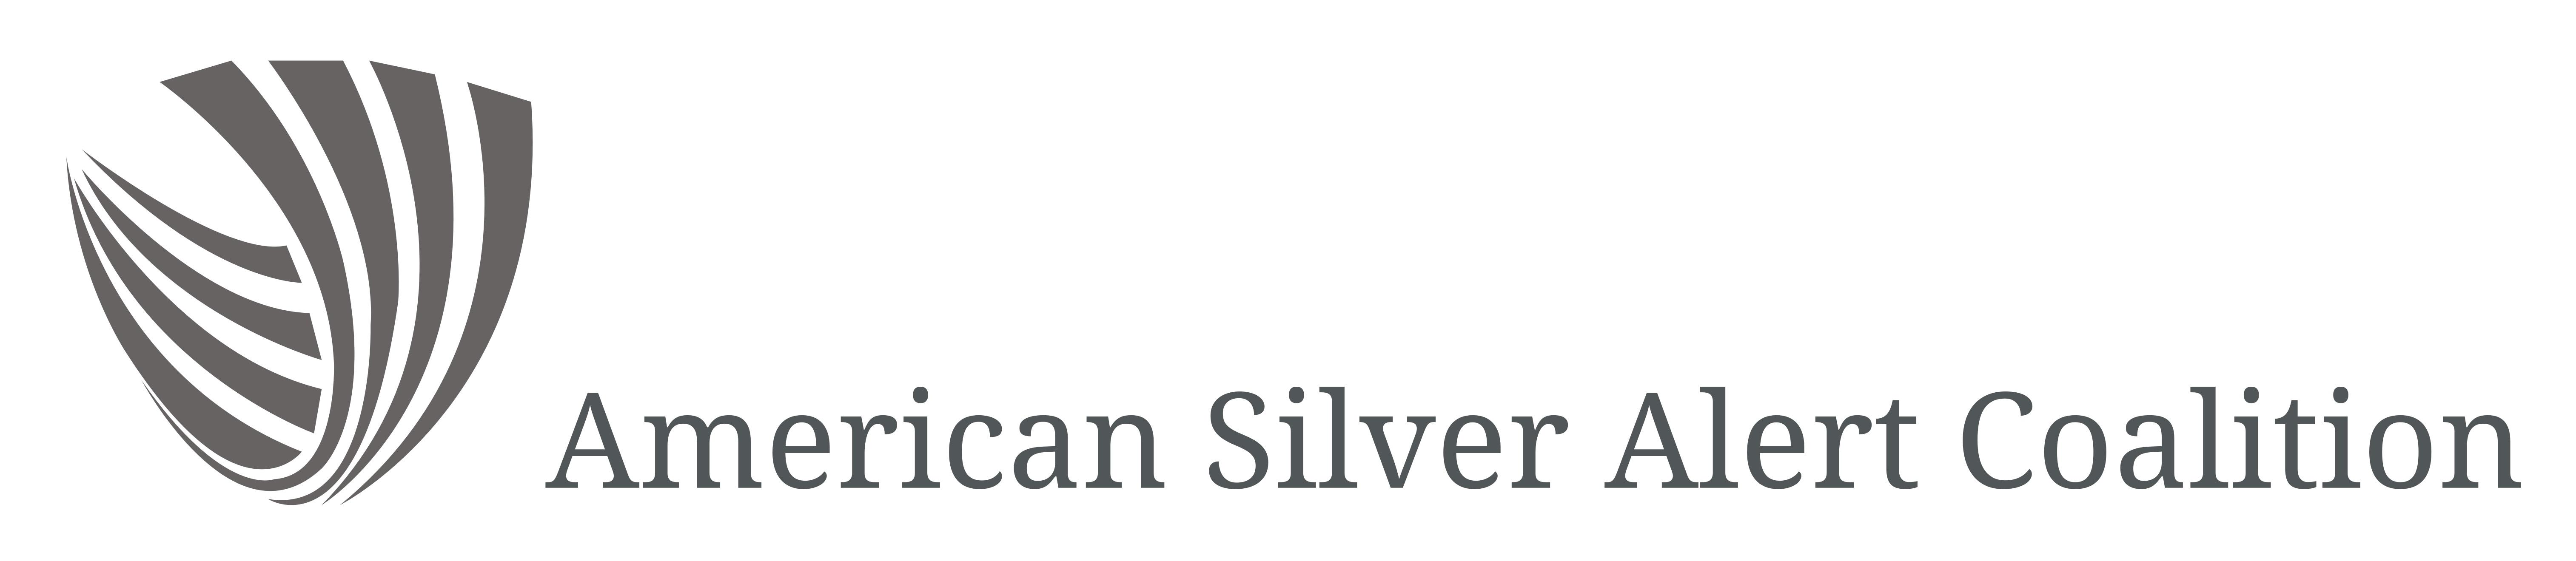 American Silver Alert Coalition